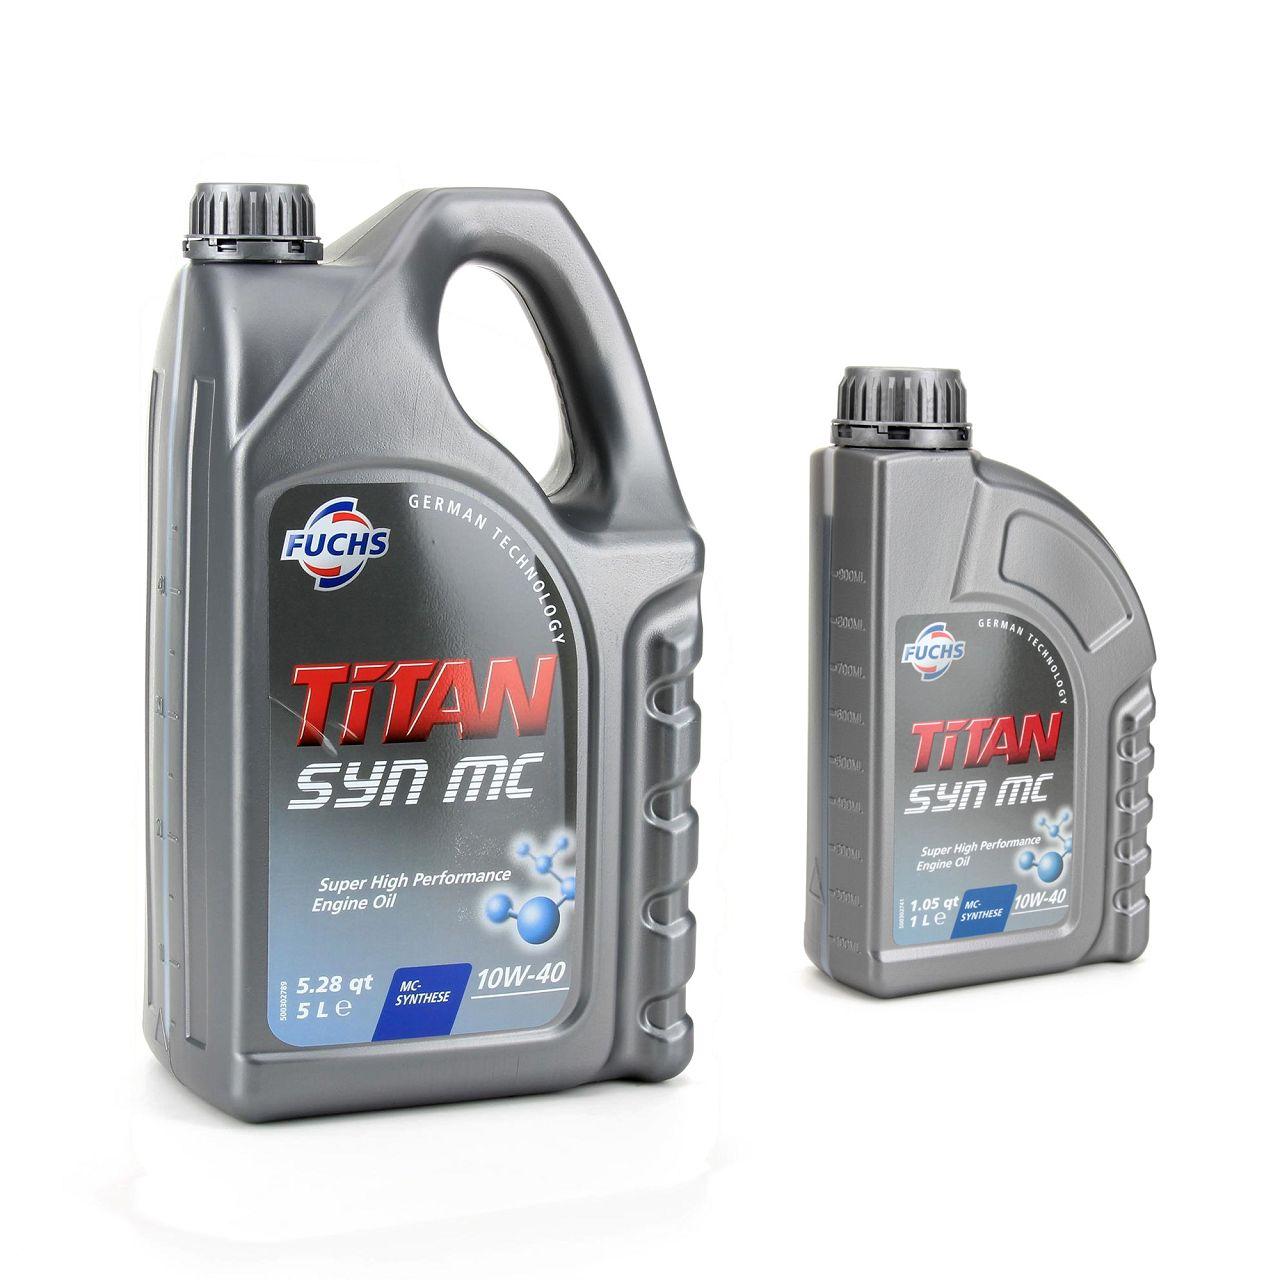 FUCHS MOTORÖL TITAN SYN MC 10W40 ACEA A3/B4 MB 229.3 VW 501.01 505.00 - 6 Liter